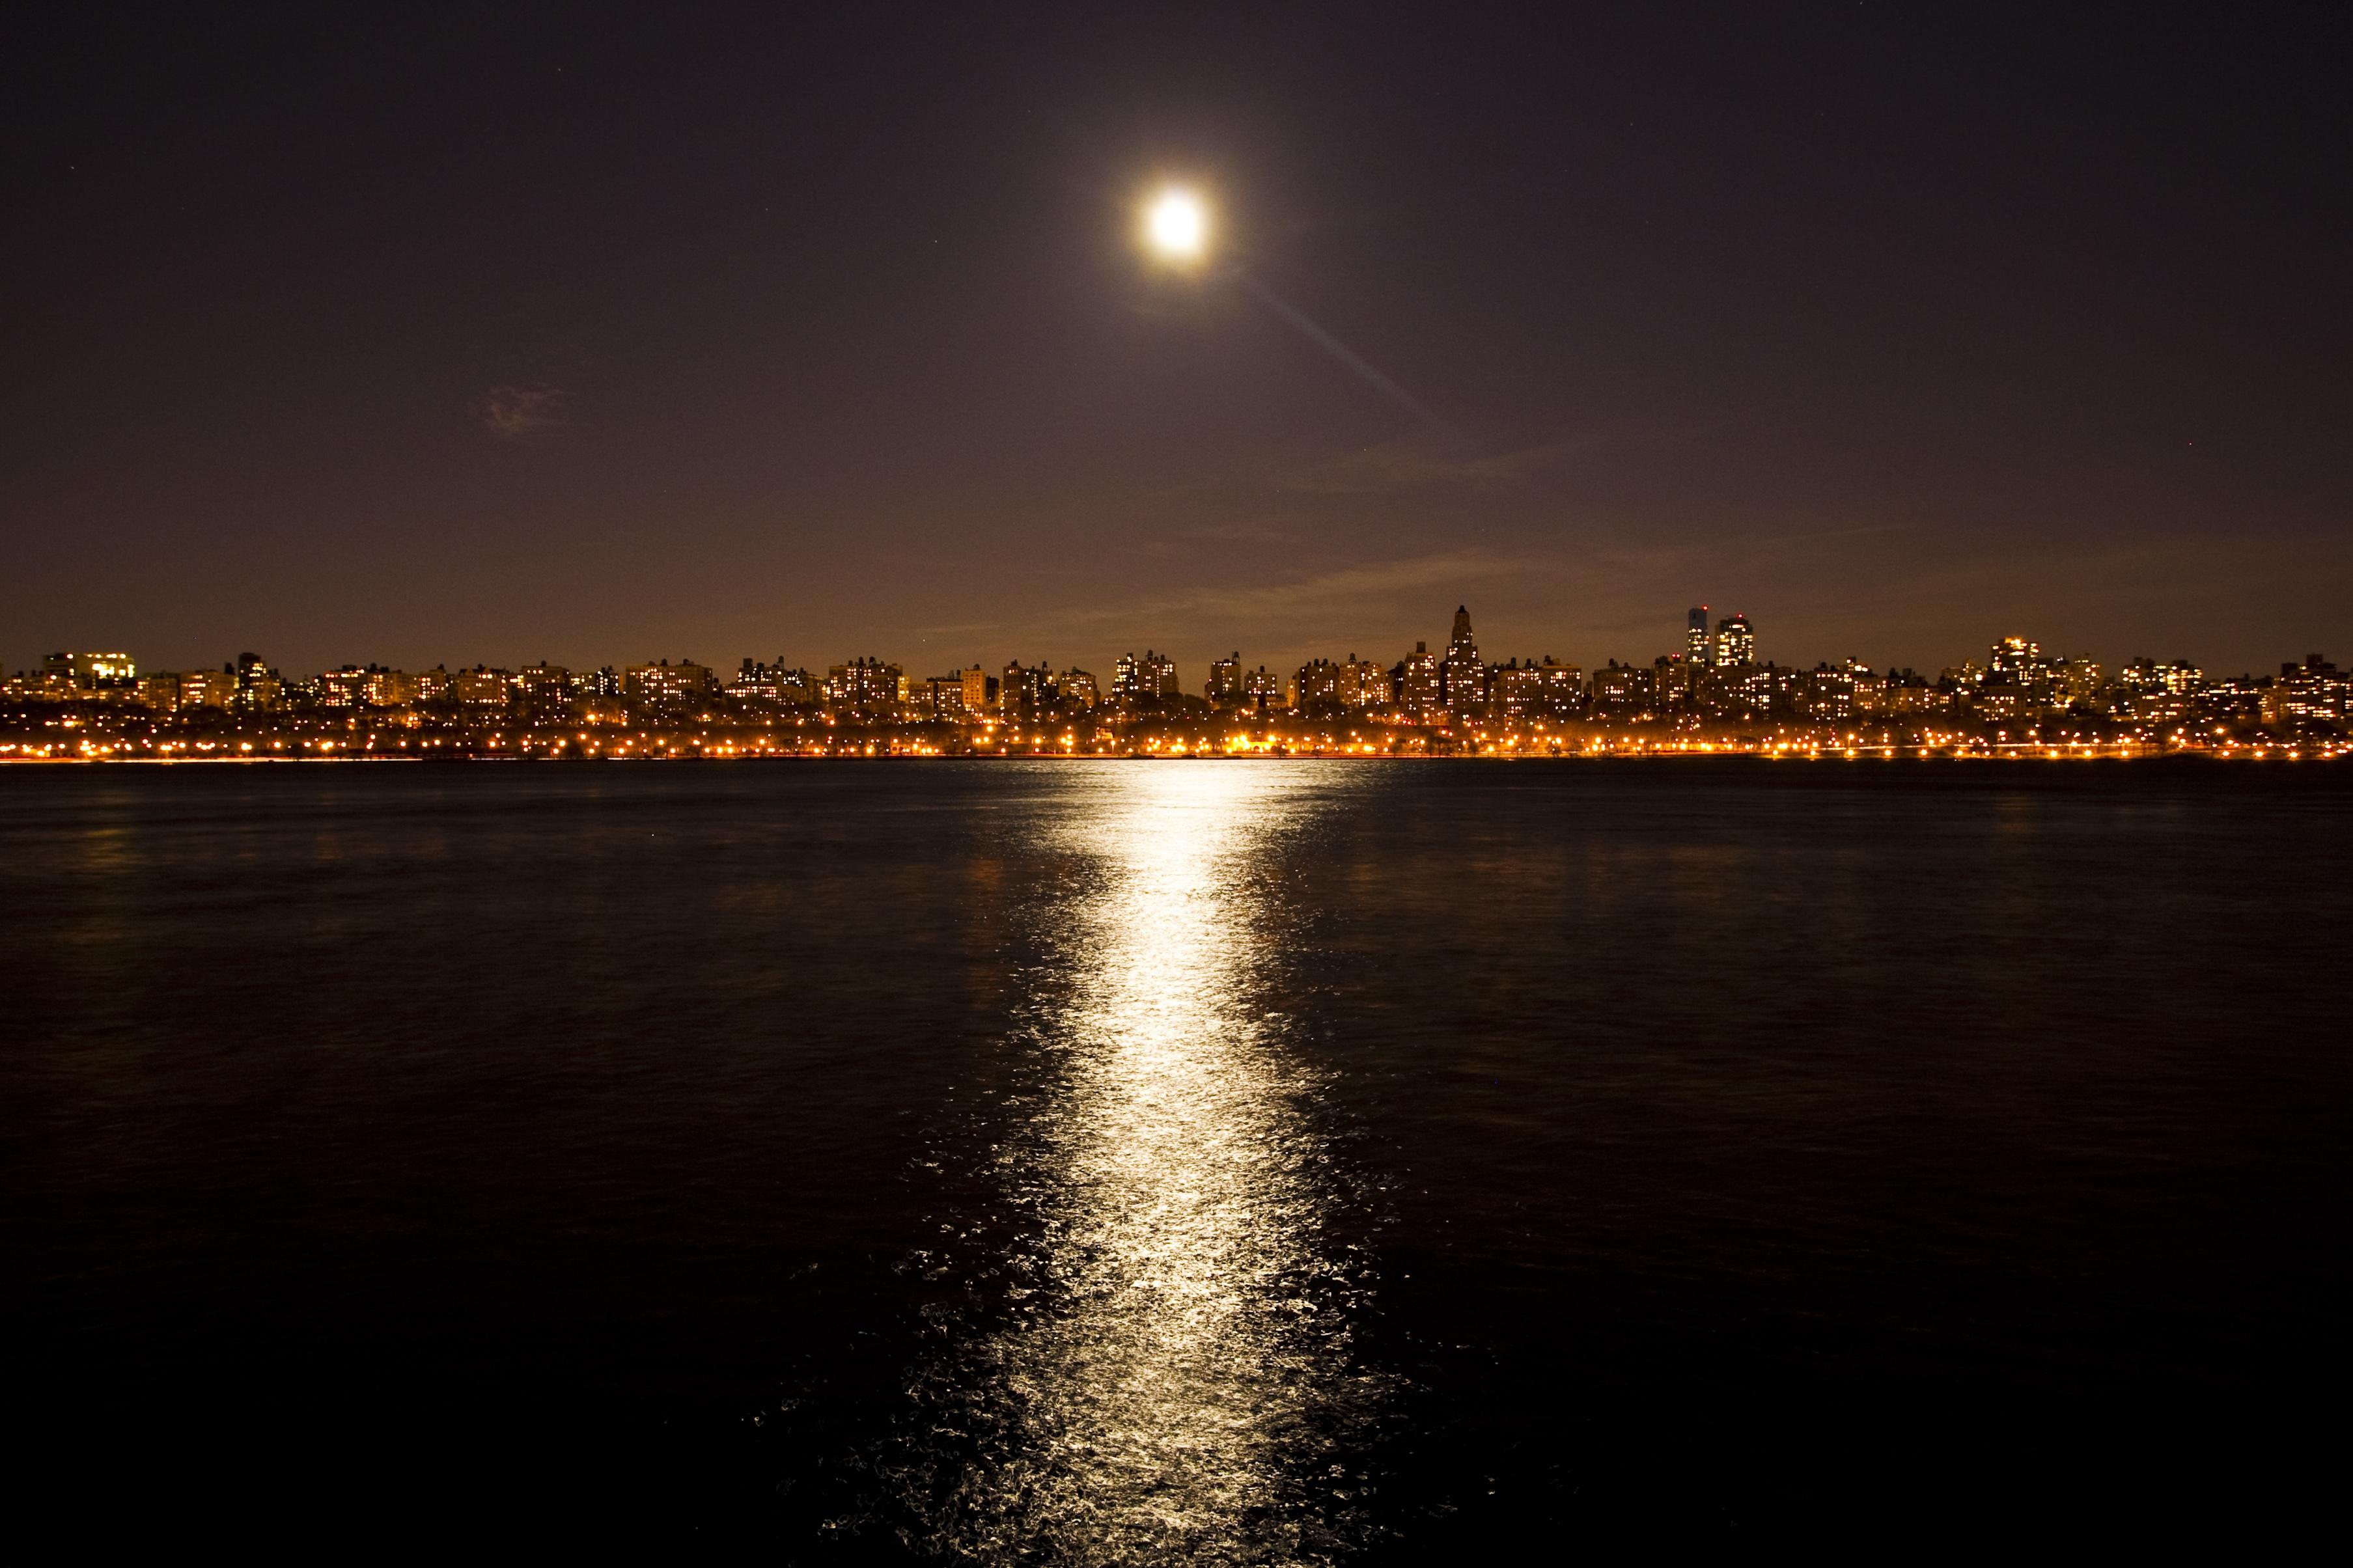 Harlem bei Nacht abb01